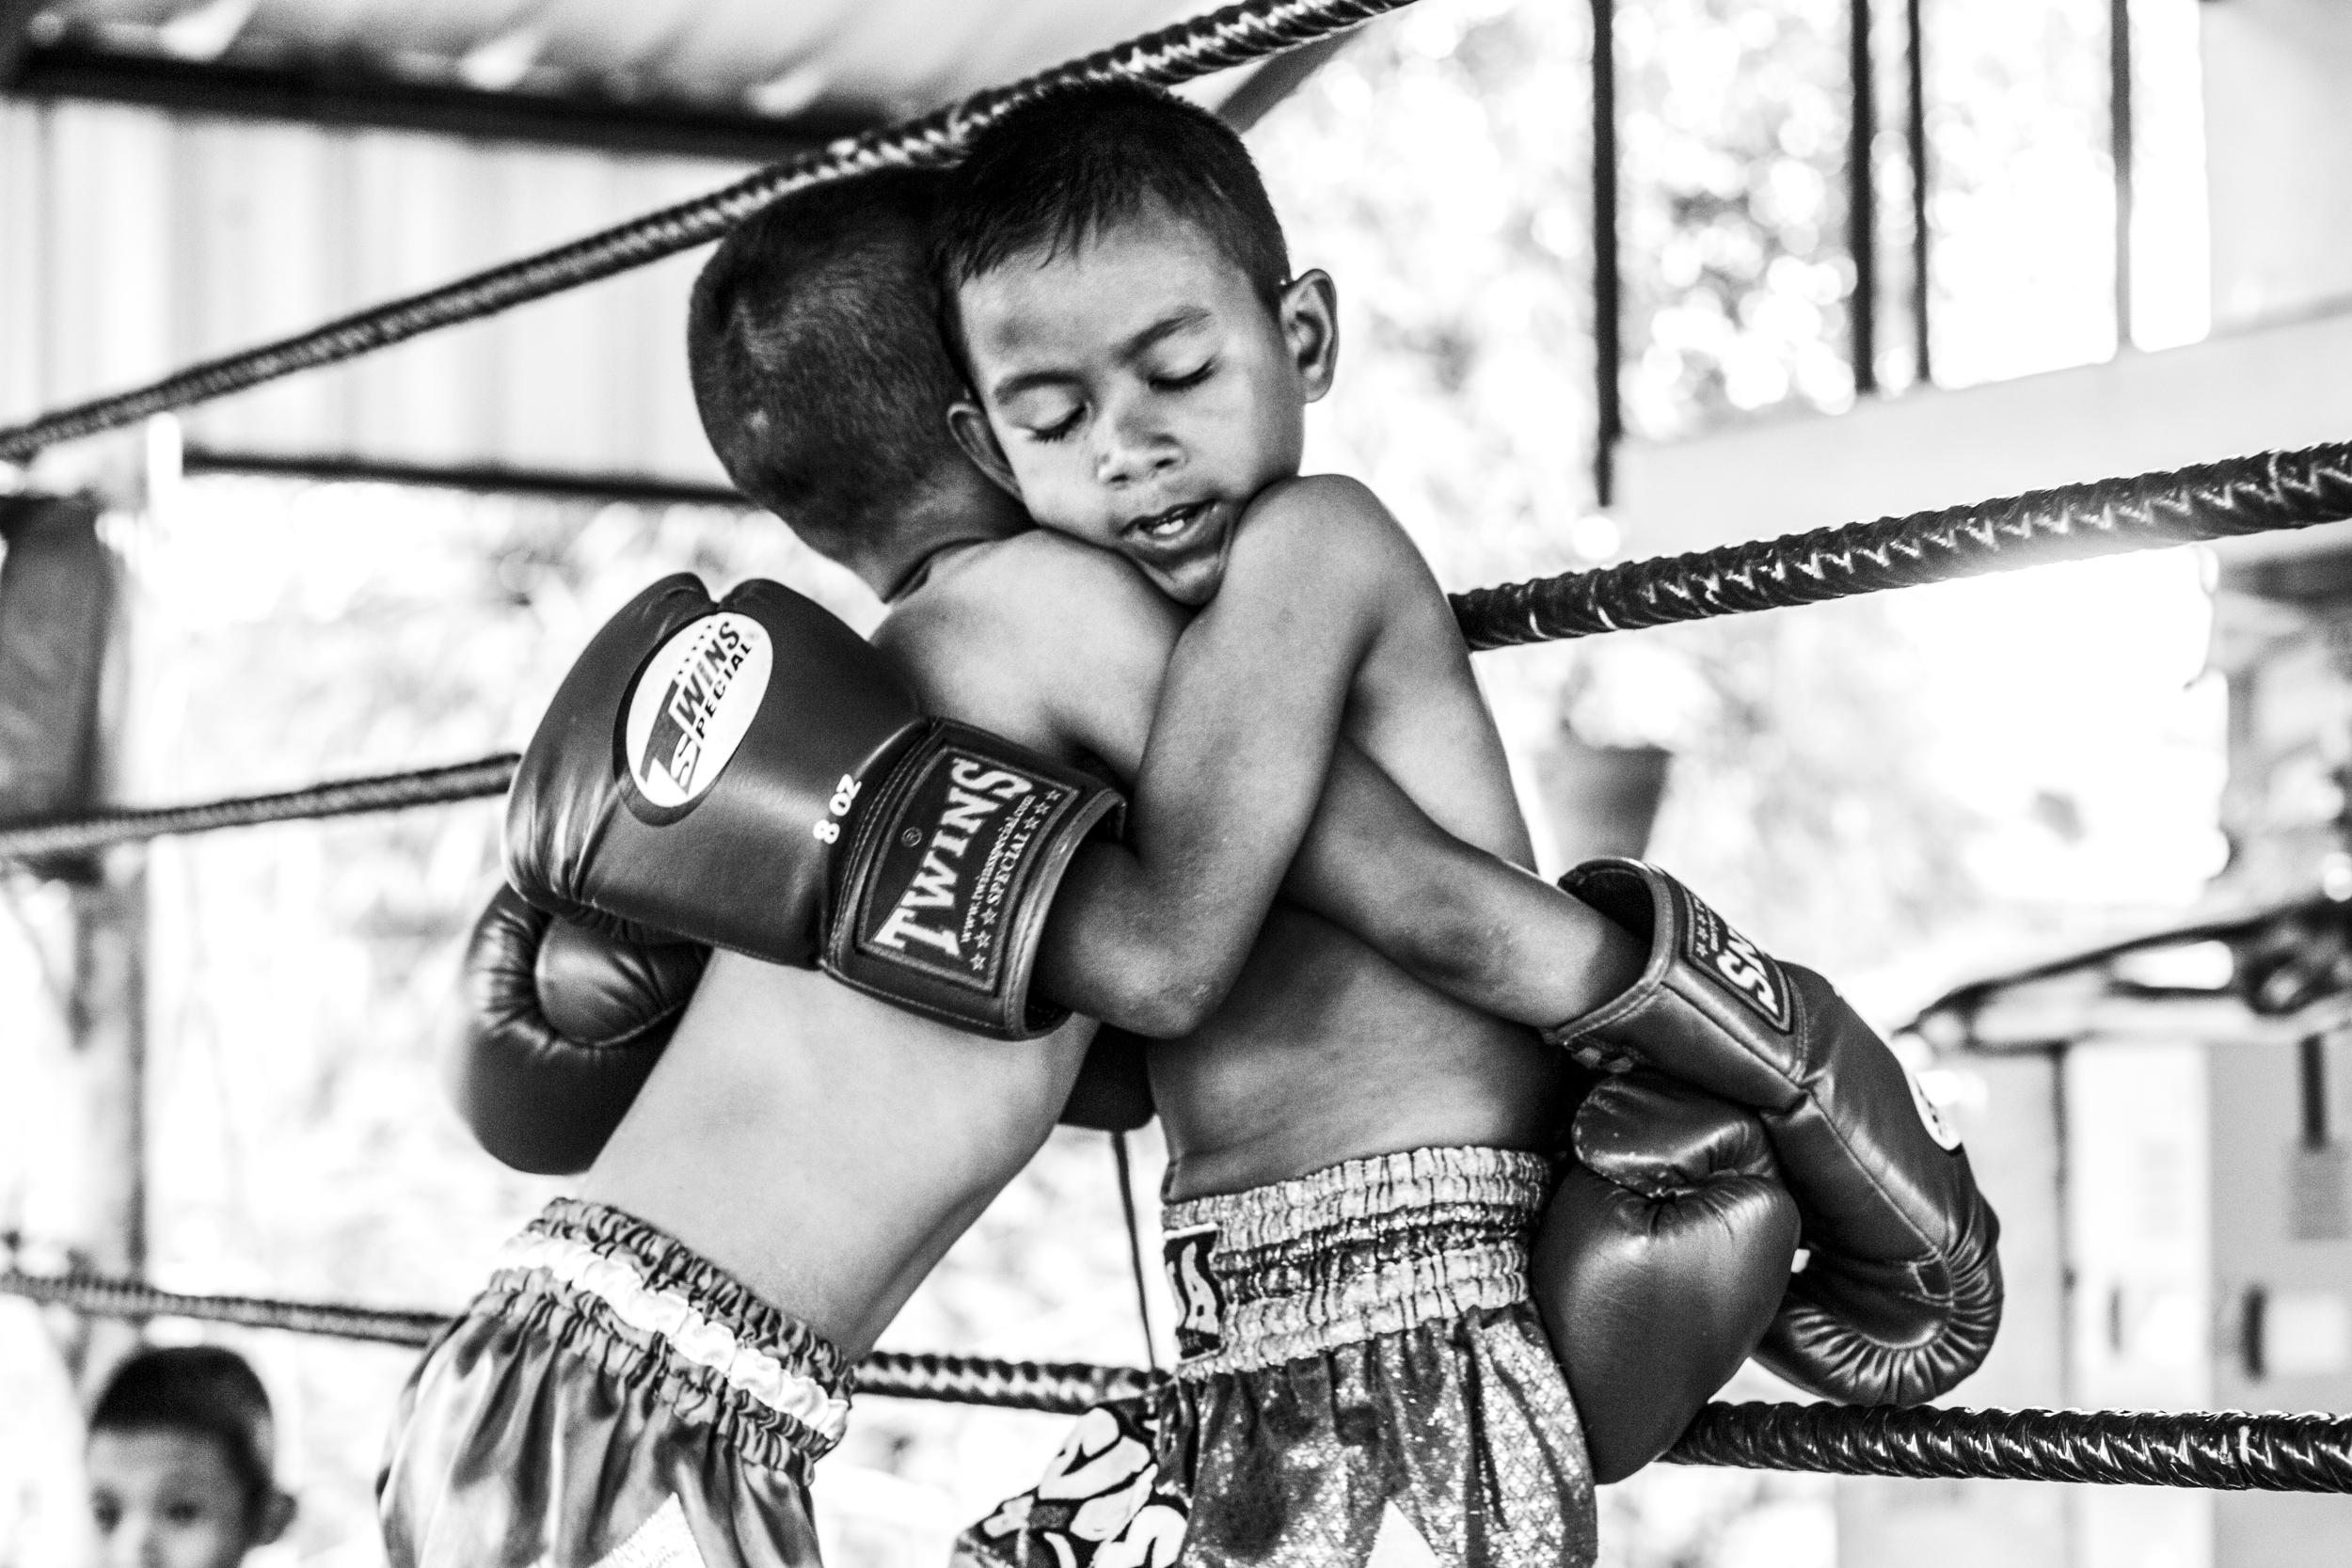 Mid-Fight (July 11, 2014 - Tha Sala, Thailand)